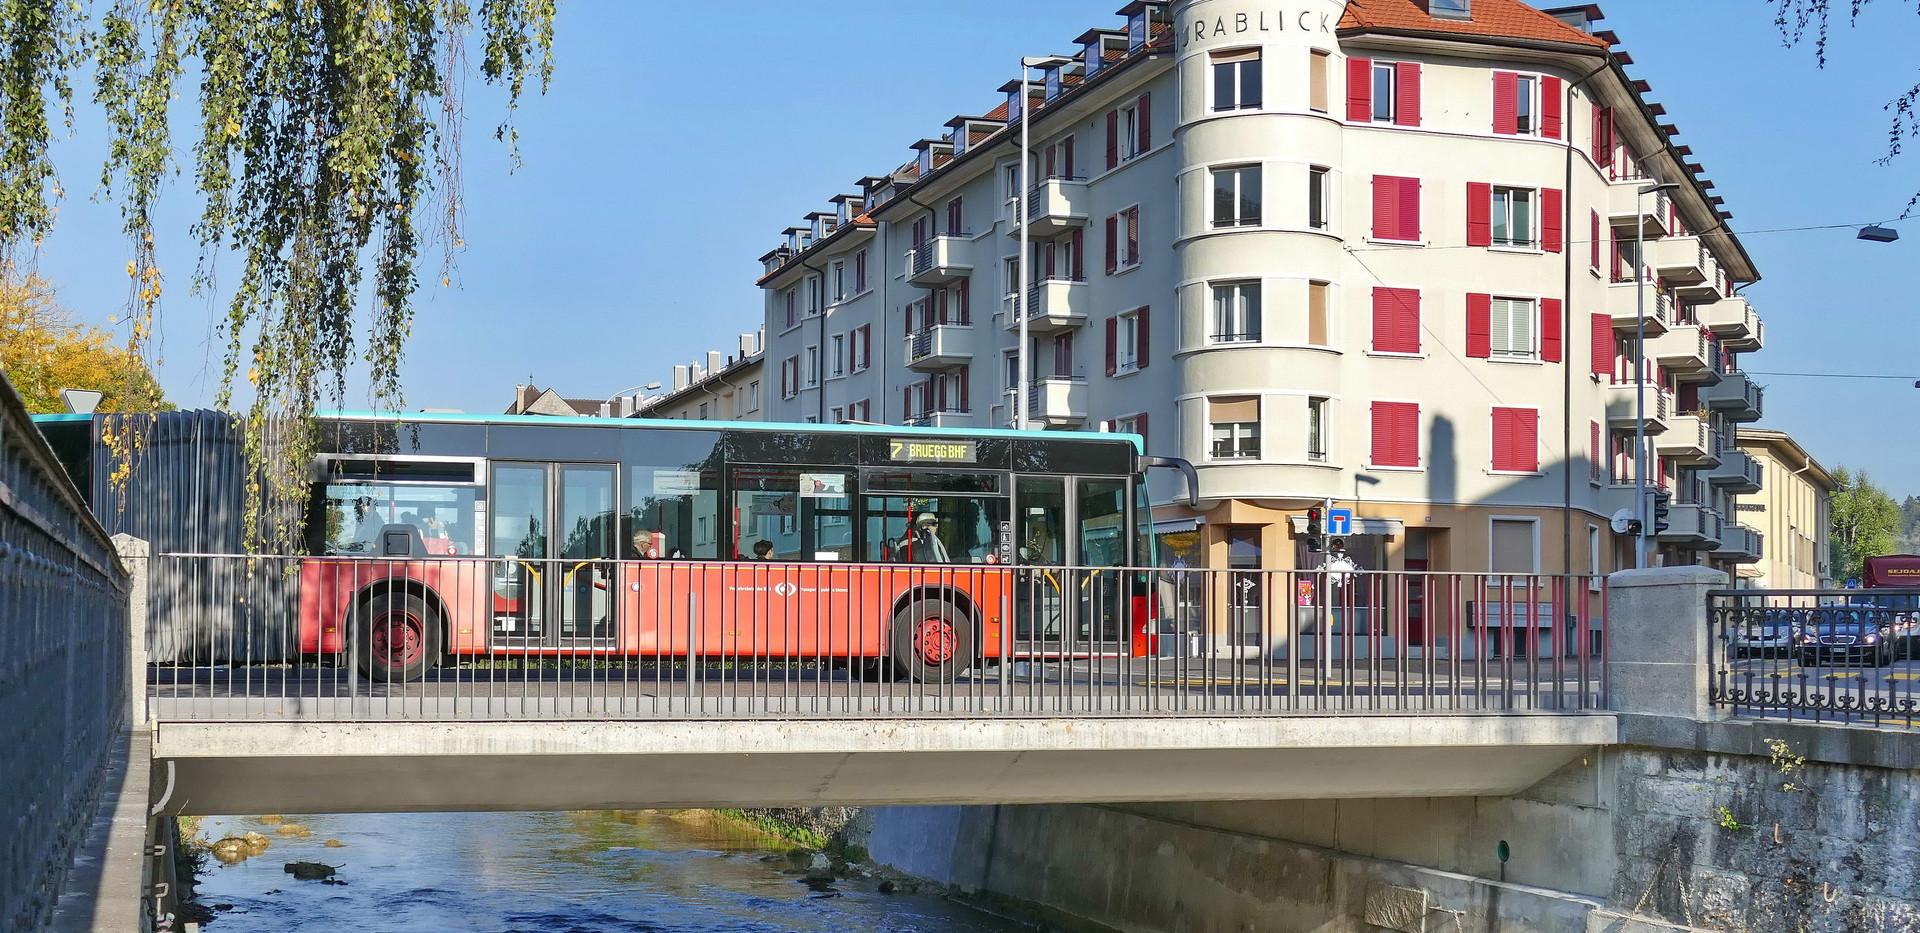 Brücke Jurastrasse, Schüss-Kanal, Biel